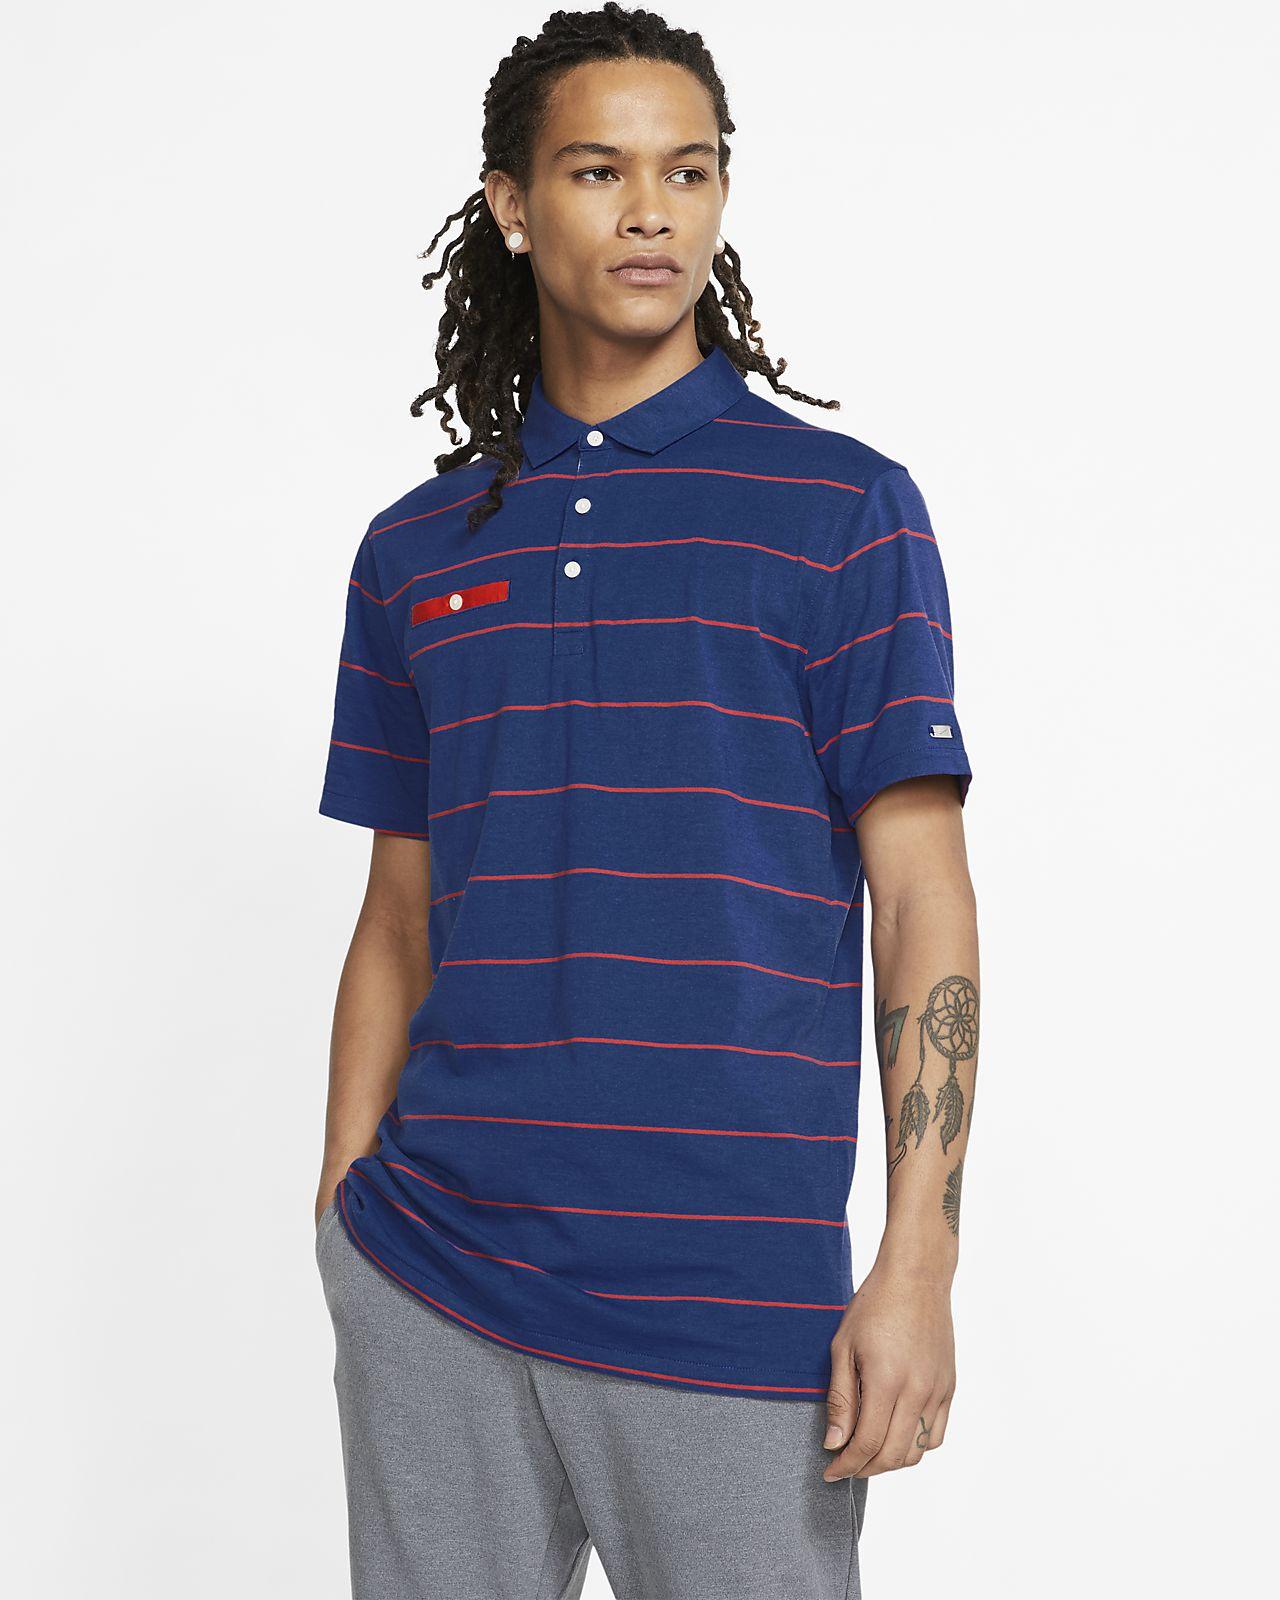 9391c27964bff8 Nike Dri-FIT Player gestreiftes Herren-Golf-Poloshirt. Nike.com LU